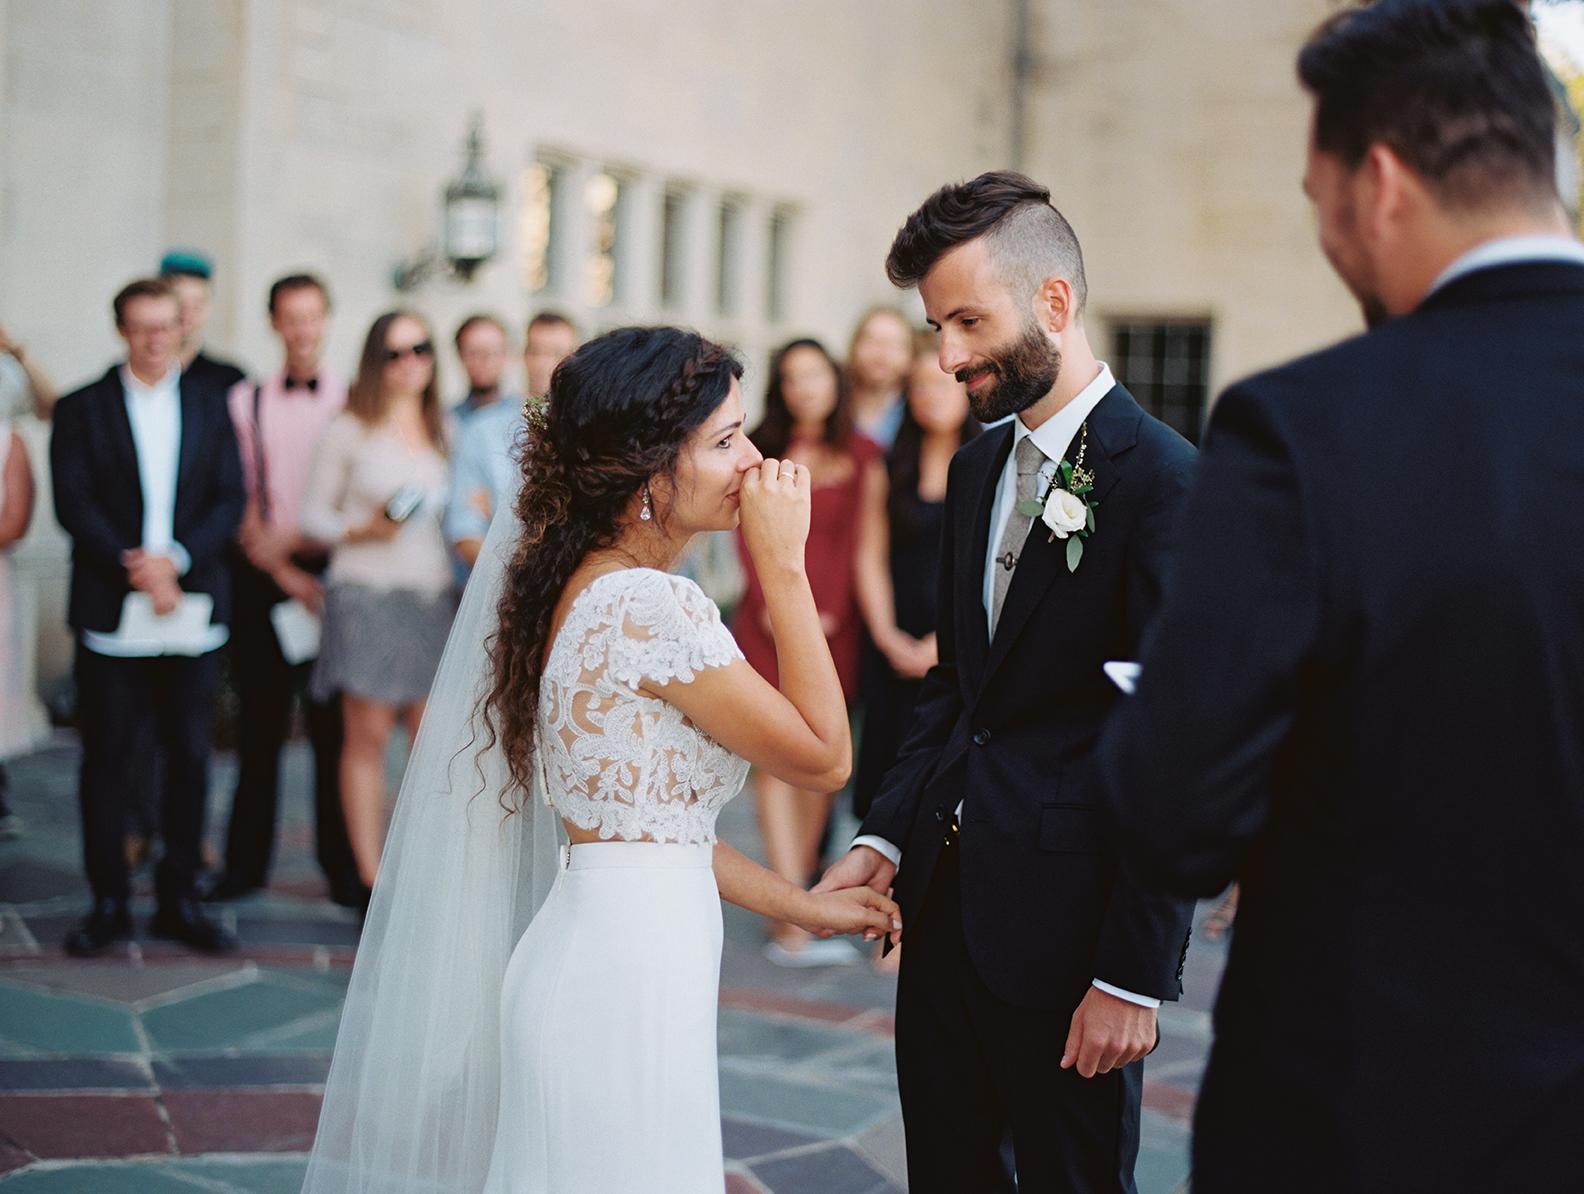 204-brian-sarra-los-angeles-wedding-brumley-wells-photography.jpg